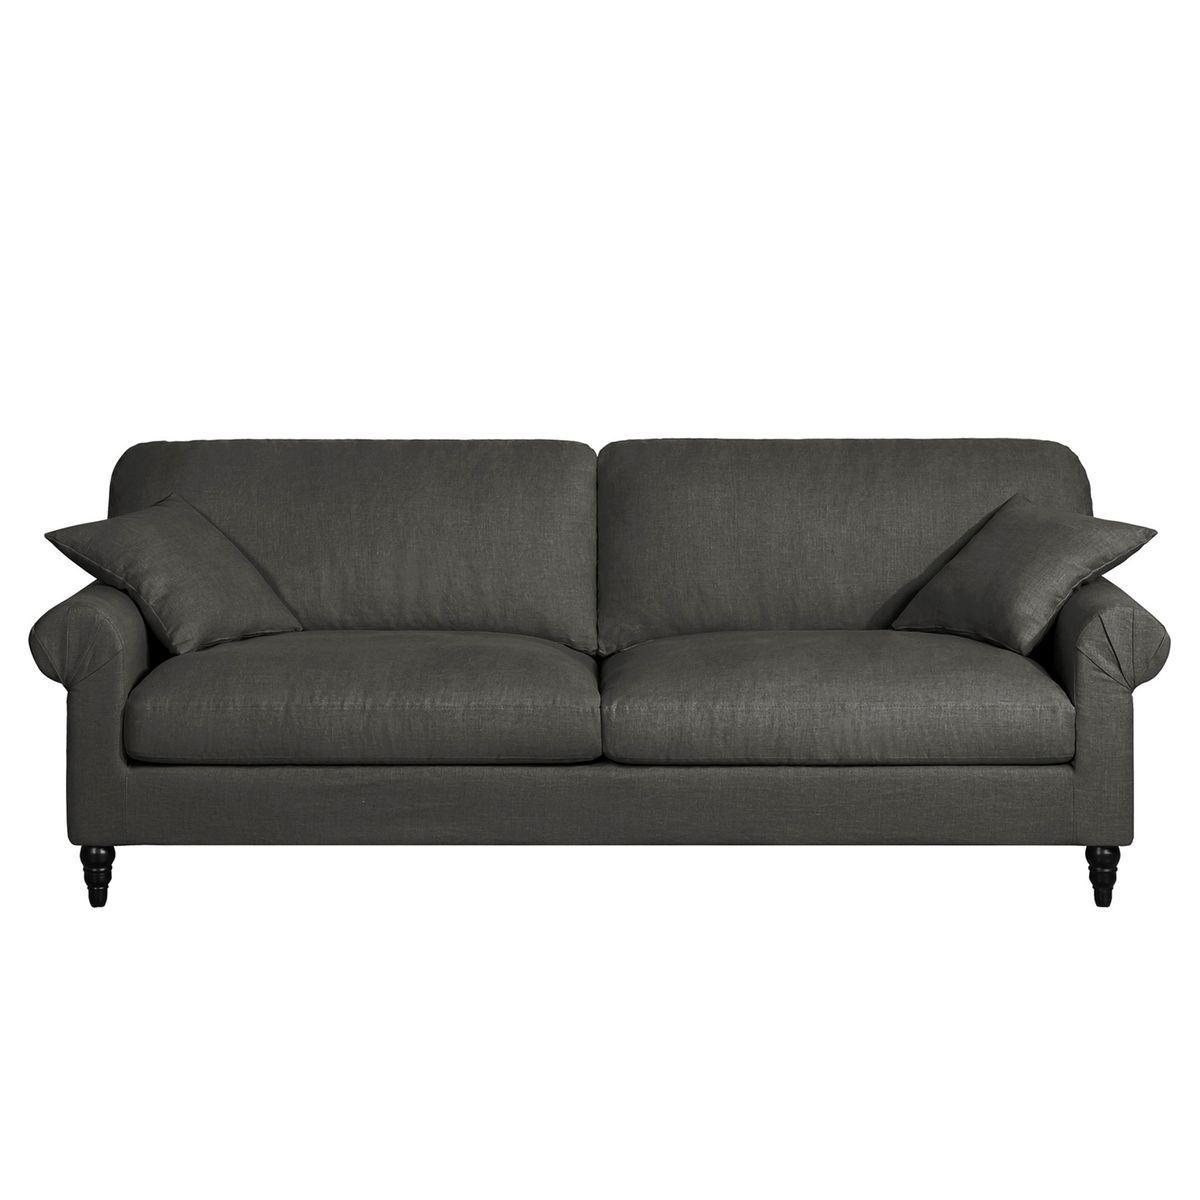 vente brouette moteur brouette moteur tritoo maison et jardin. Black Bedroom Furniture Sets. Home Design Ideas